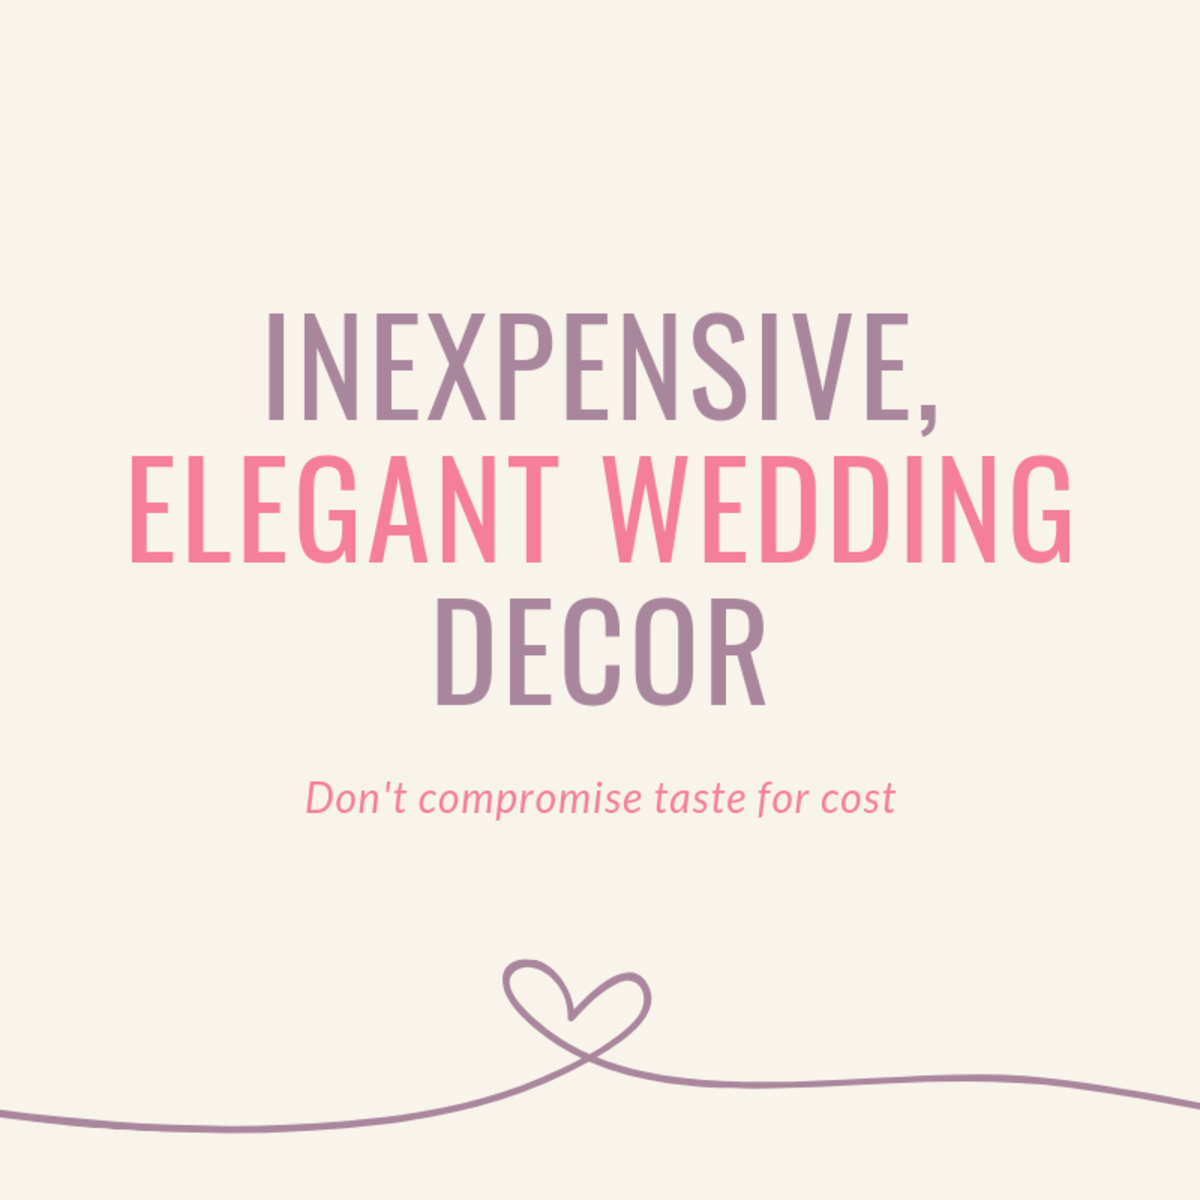 Inexpensive yet Elegant Wedding Reception Decorating Ideas & Tips